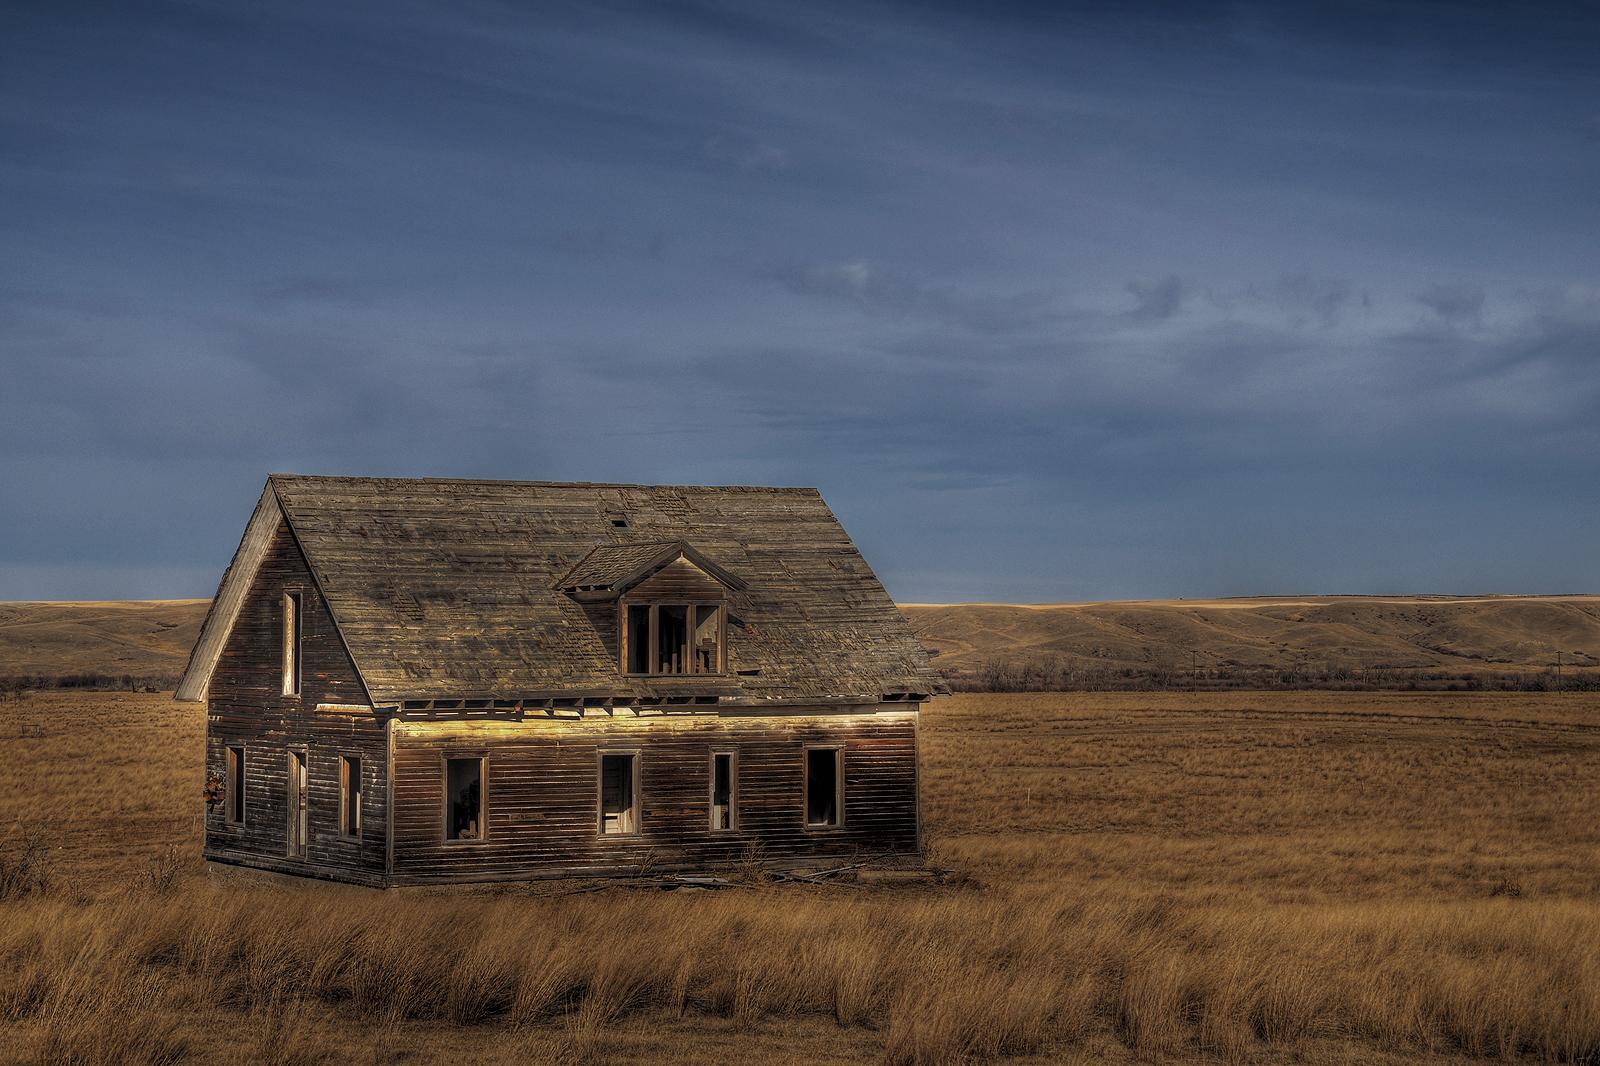 Hintergrundbilder : Landschaft, Alt, Hügel, Verlassen, Gras, Himmel, Feld,  Holz, Haus, Bauernhof, Horizont, Kanada, Nikon, Scheune, Hütte, Stroh,  Alberta, ...